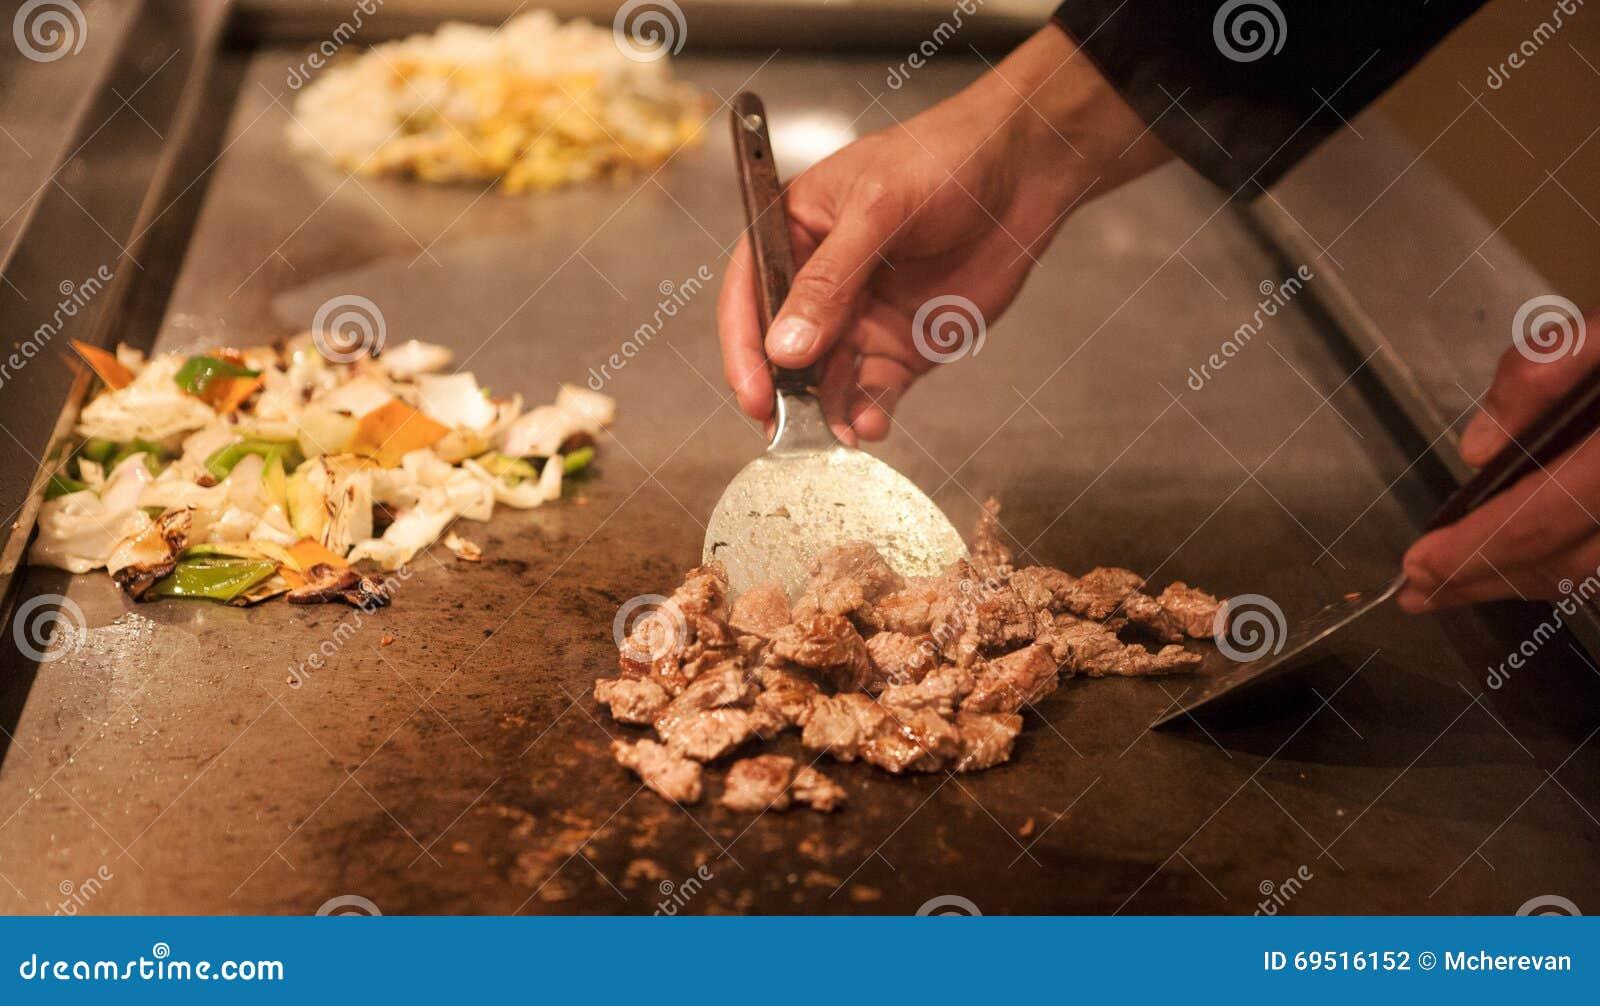 Chinese Food Kitchener